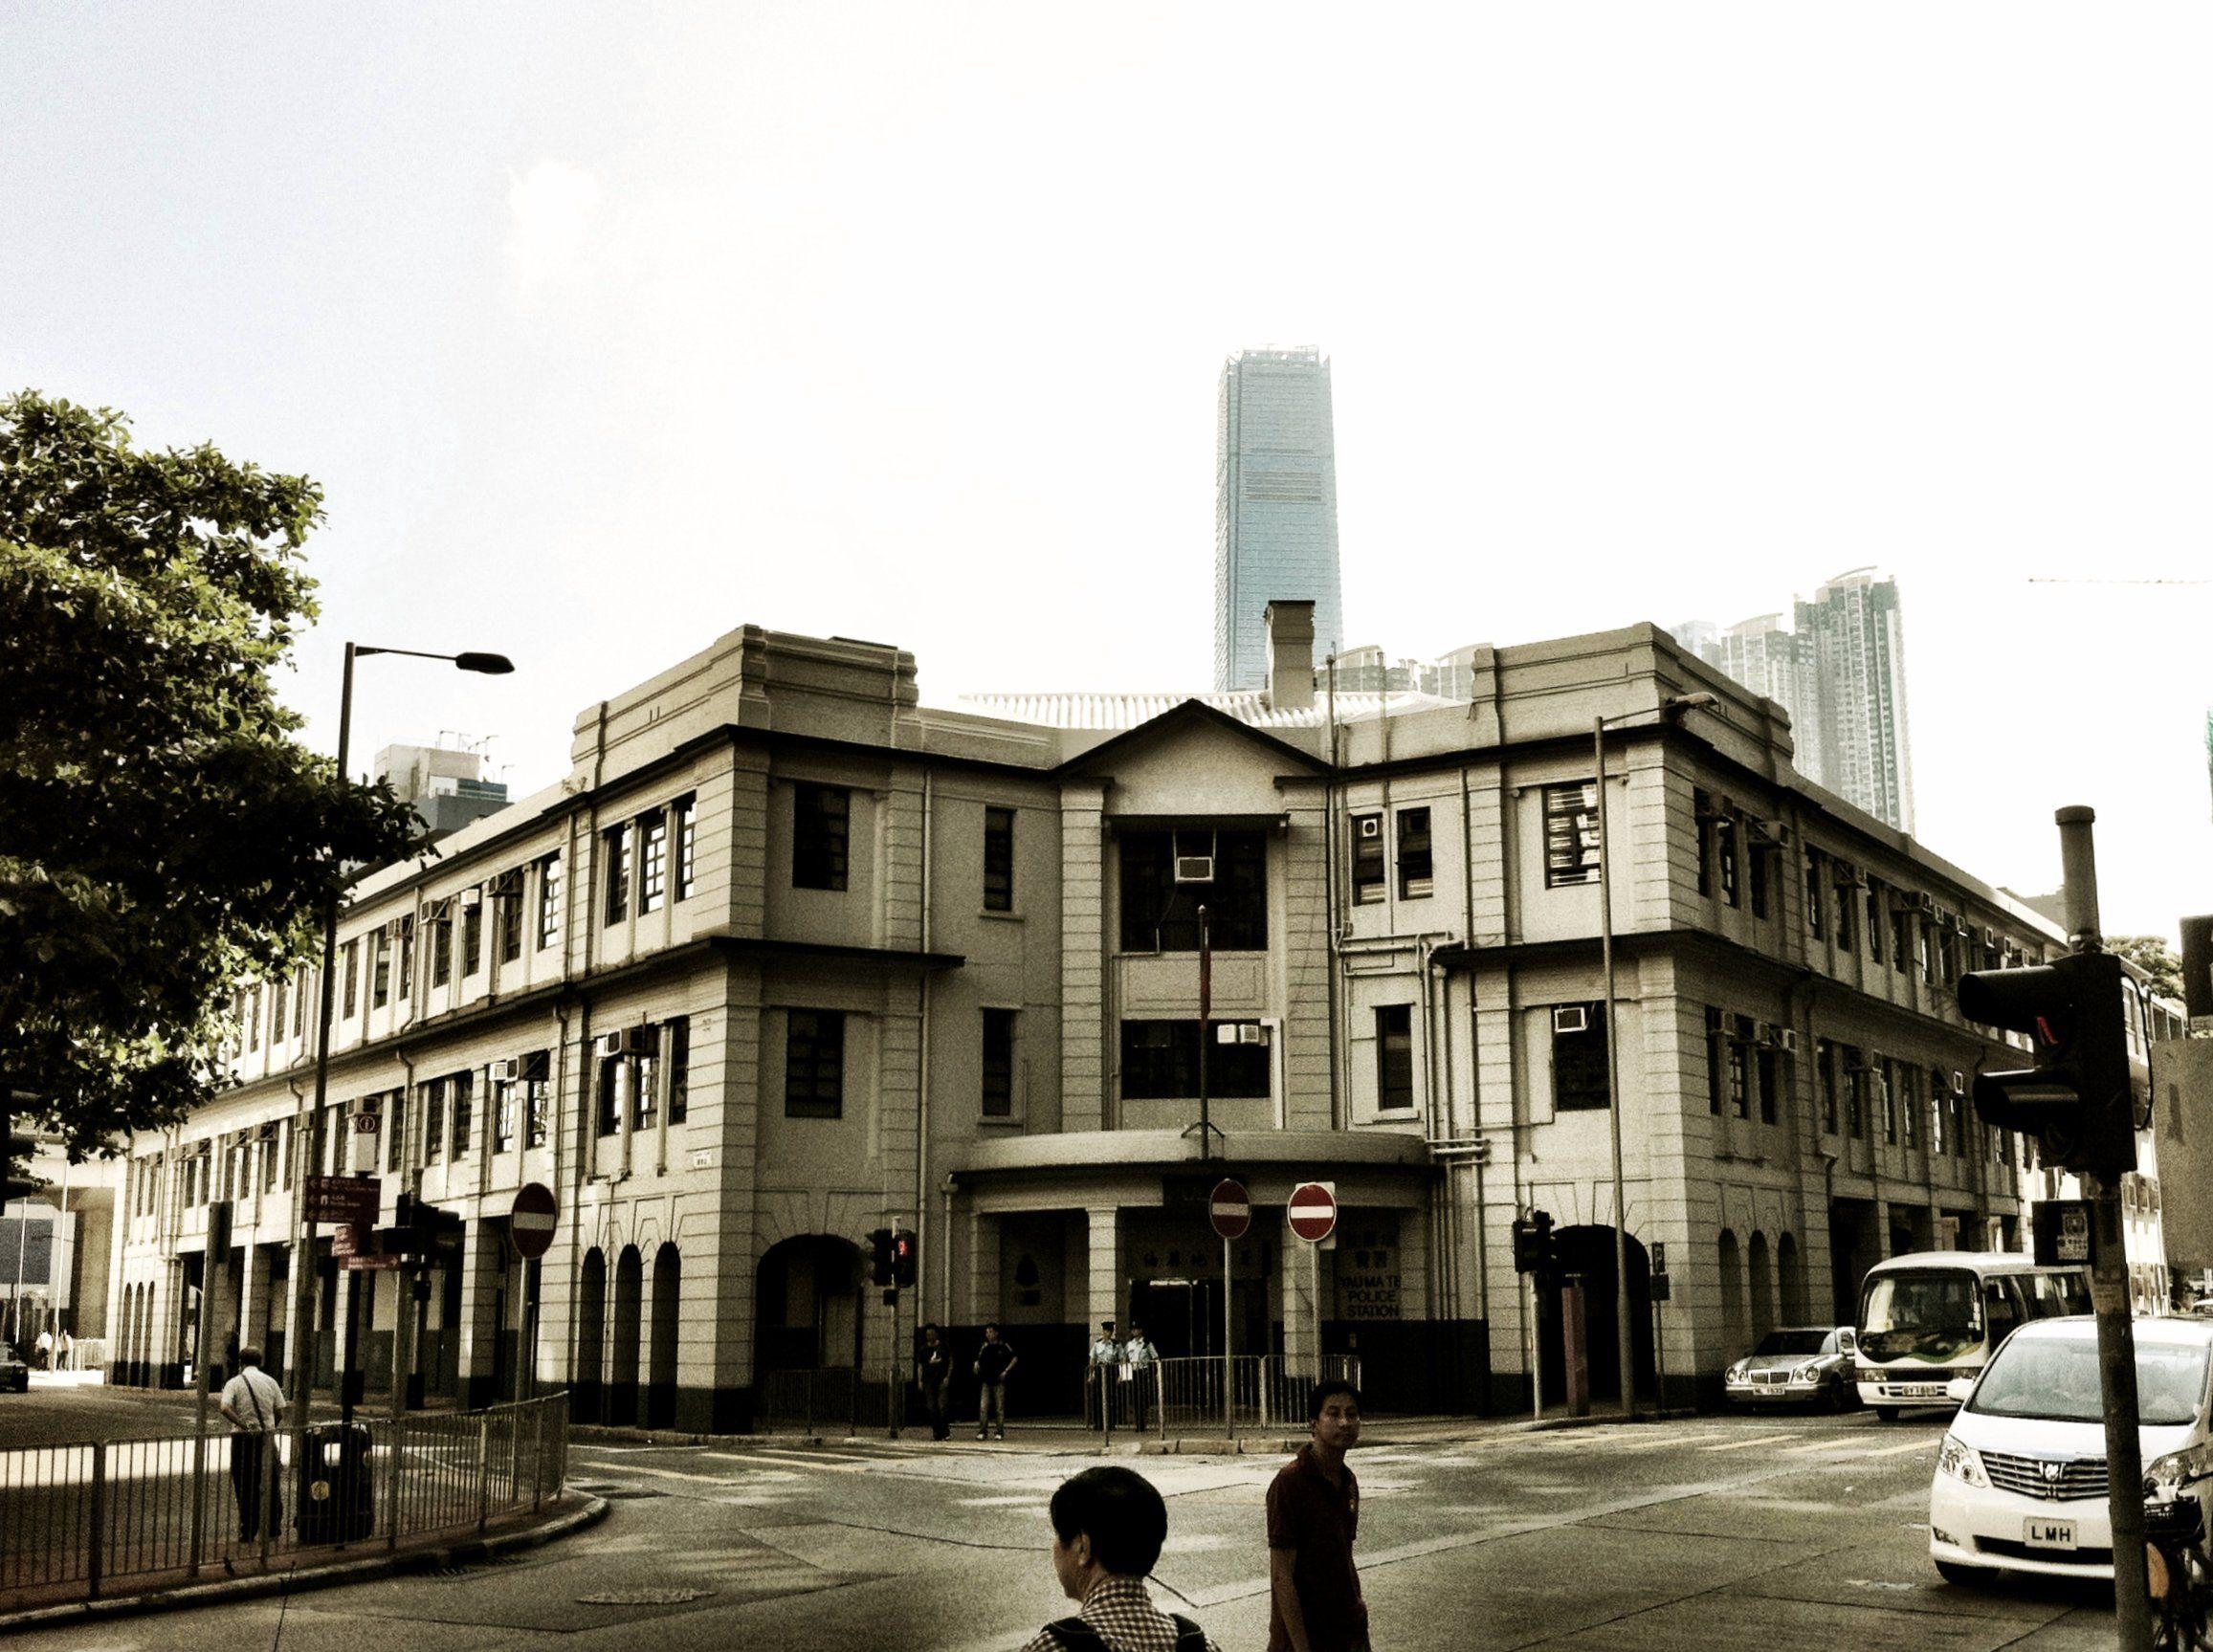 Yau Ma Tei Police Station - 627 Canton Rd. Kowloon. Hong Kong. Built in 1922. it's just around the corner fr…   The neighbourhood. Yau ma tei ...